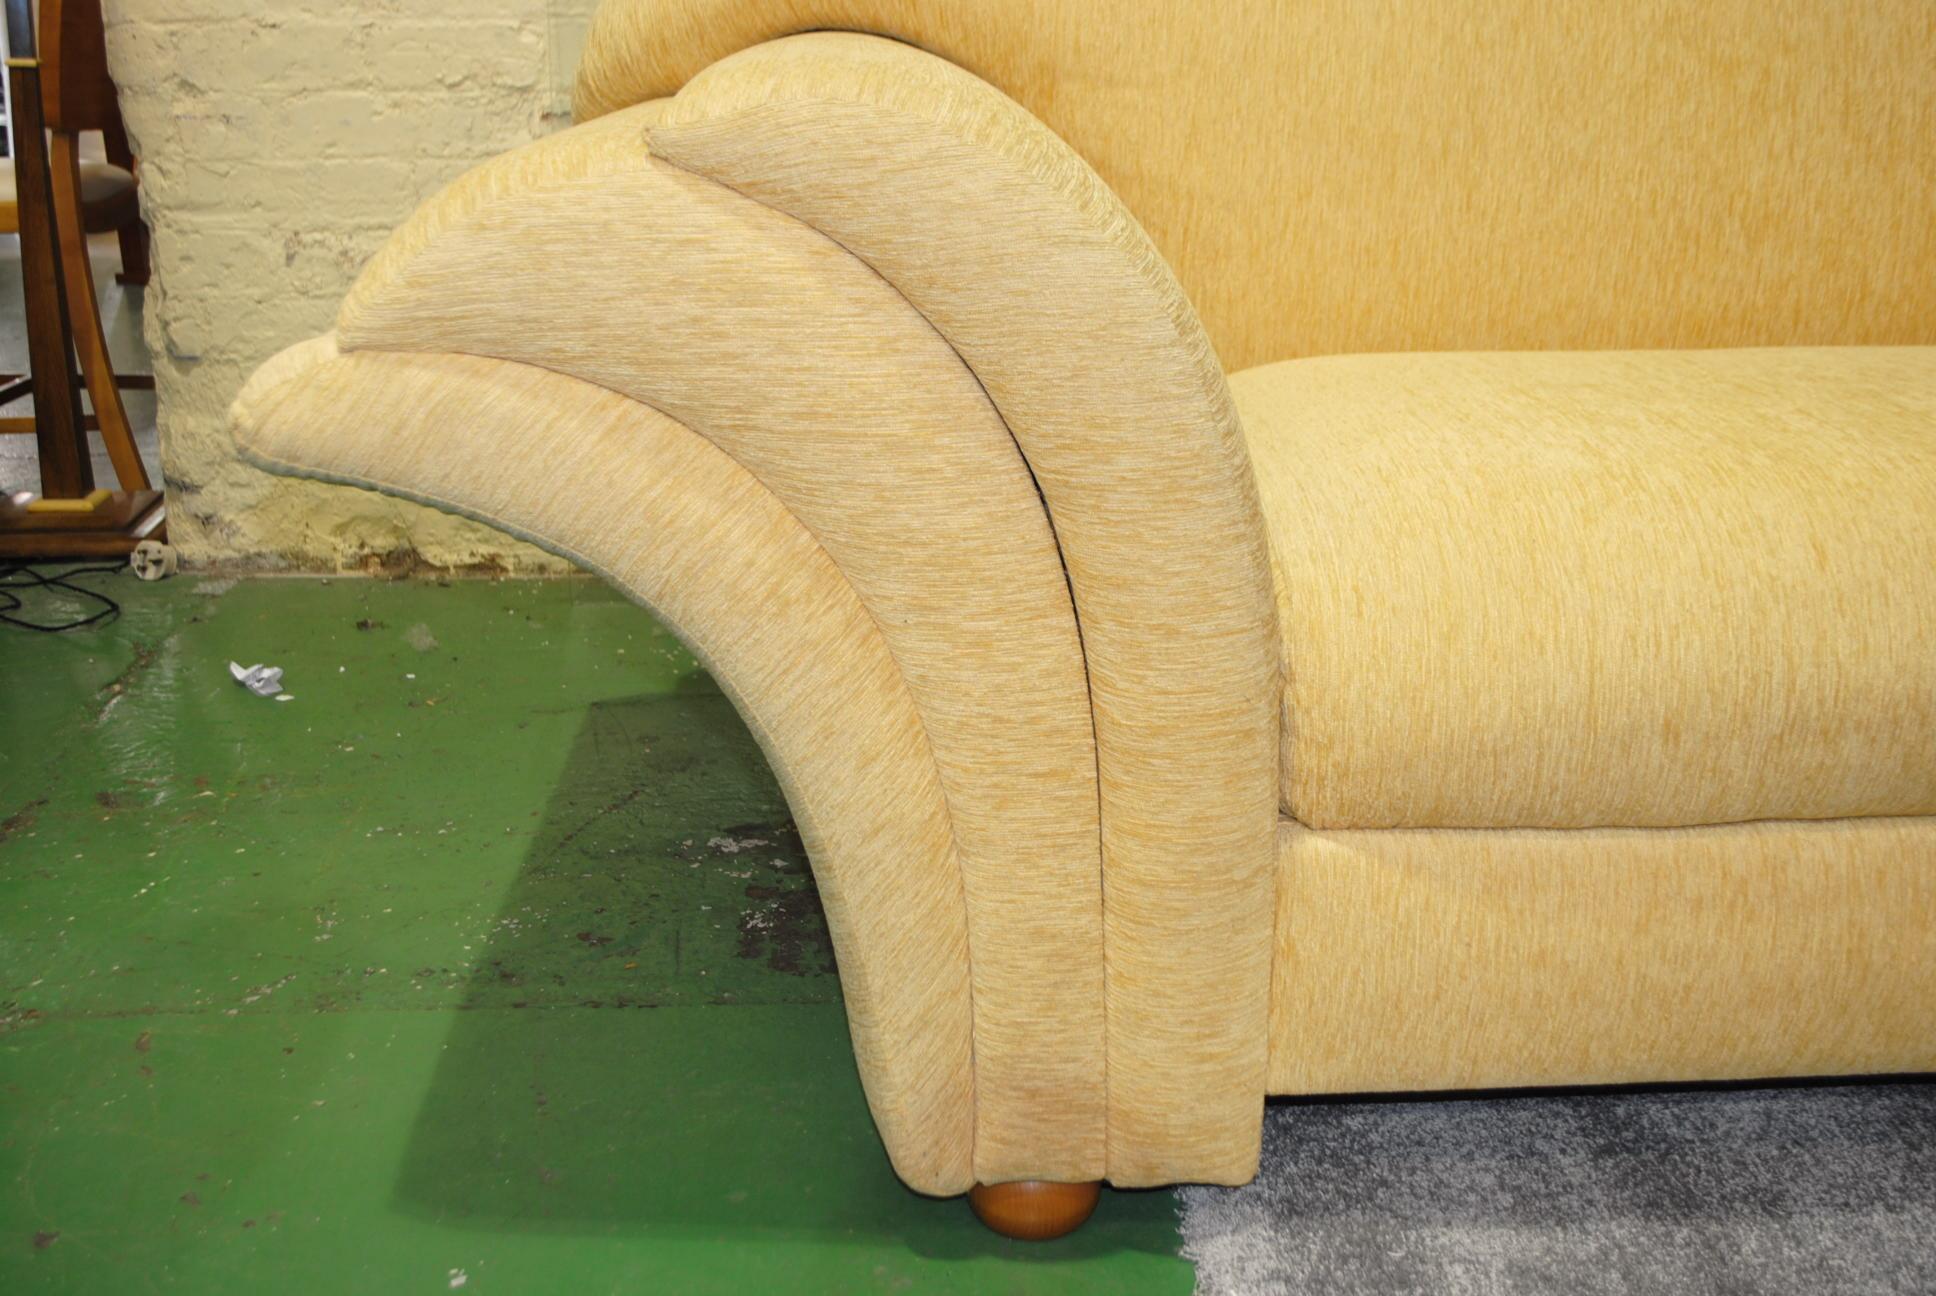 Large art deco chaise cloud 9 art deco furniture sales for Chaise furniture sale